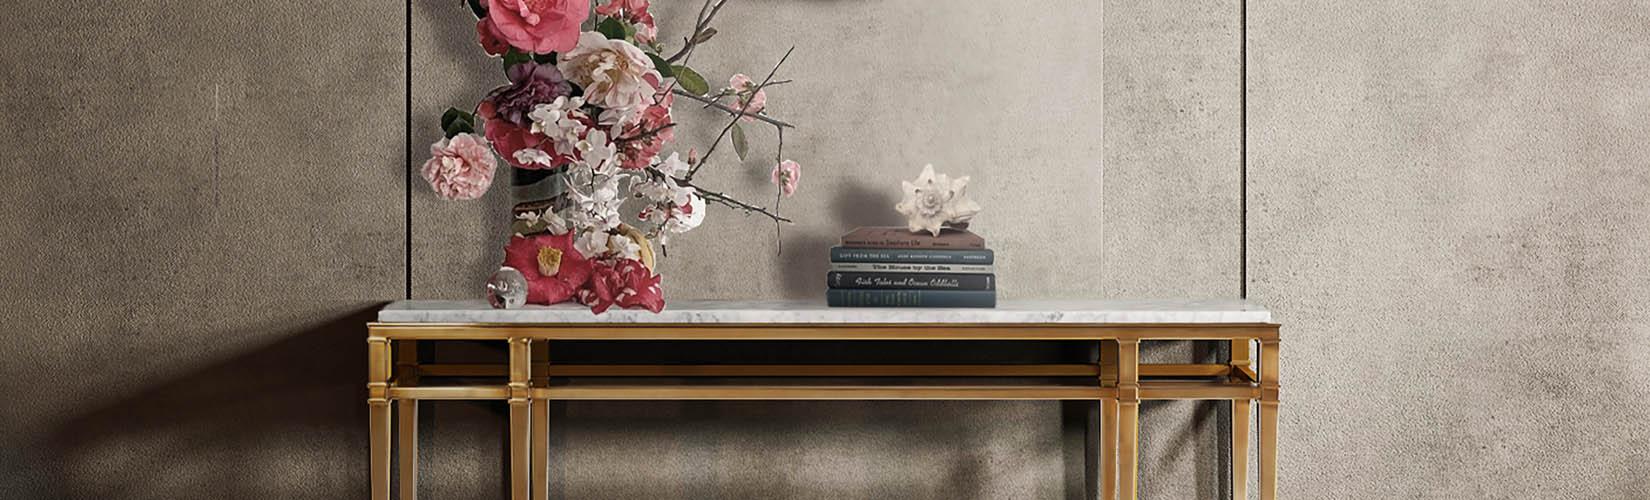 Theodore Alexander Furniture: Brand Focus